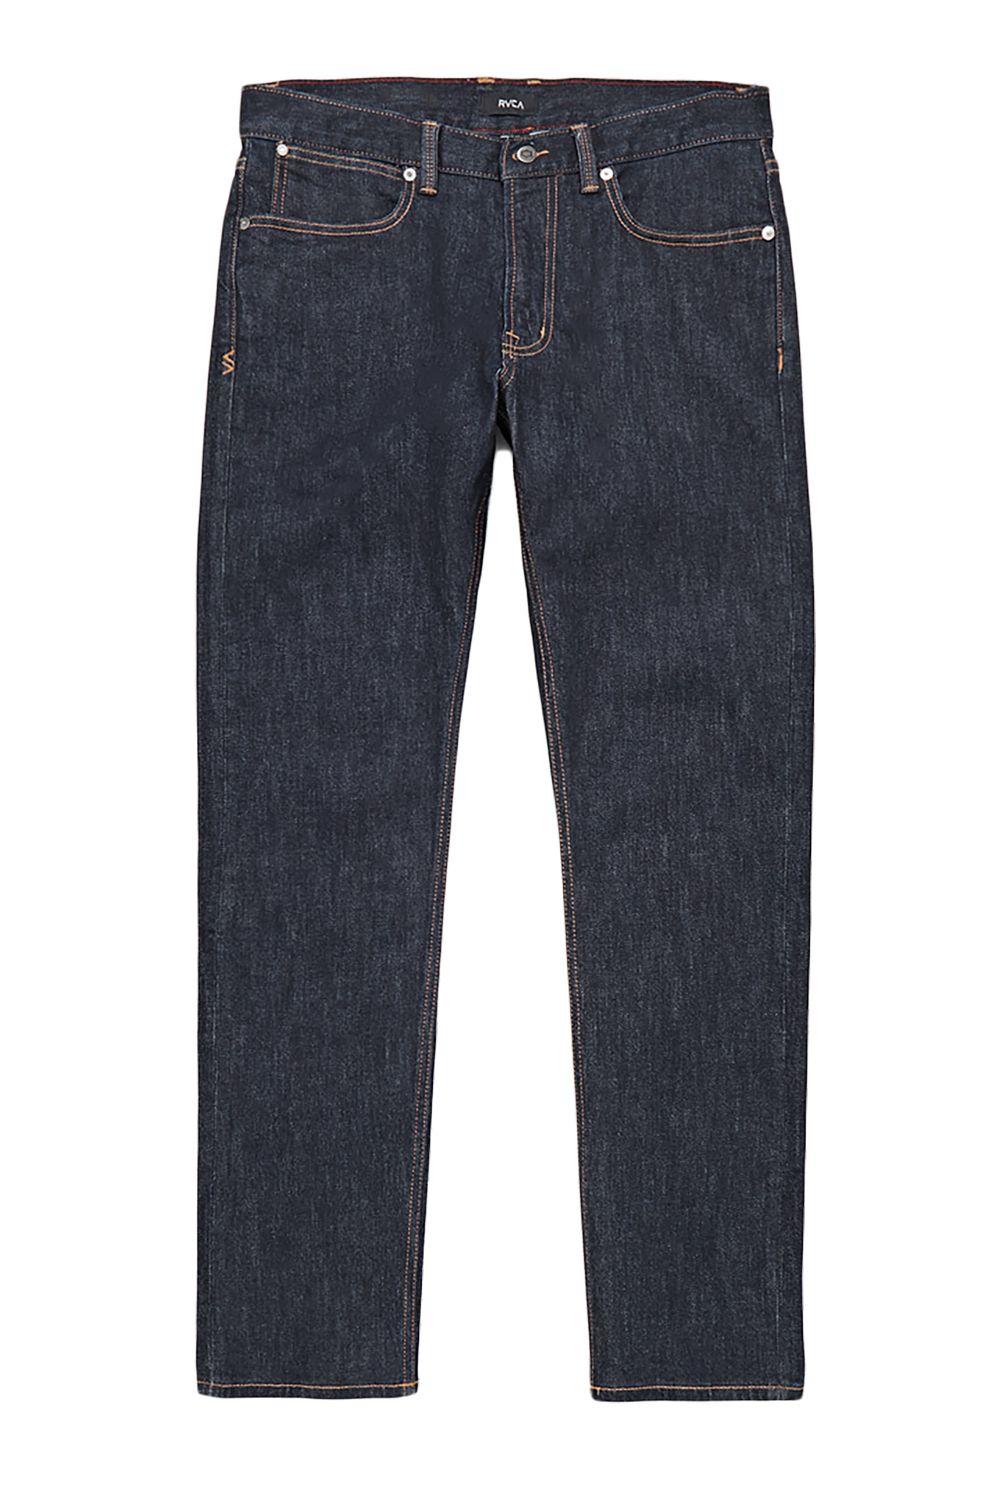 RVCA Pant Jeans DAGGERS DENIM Dark Indigo